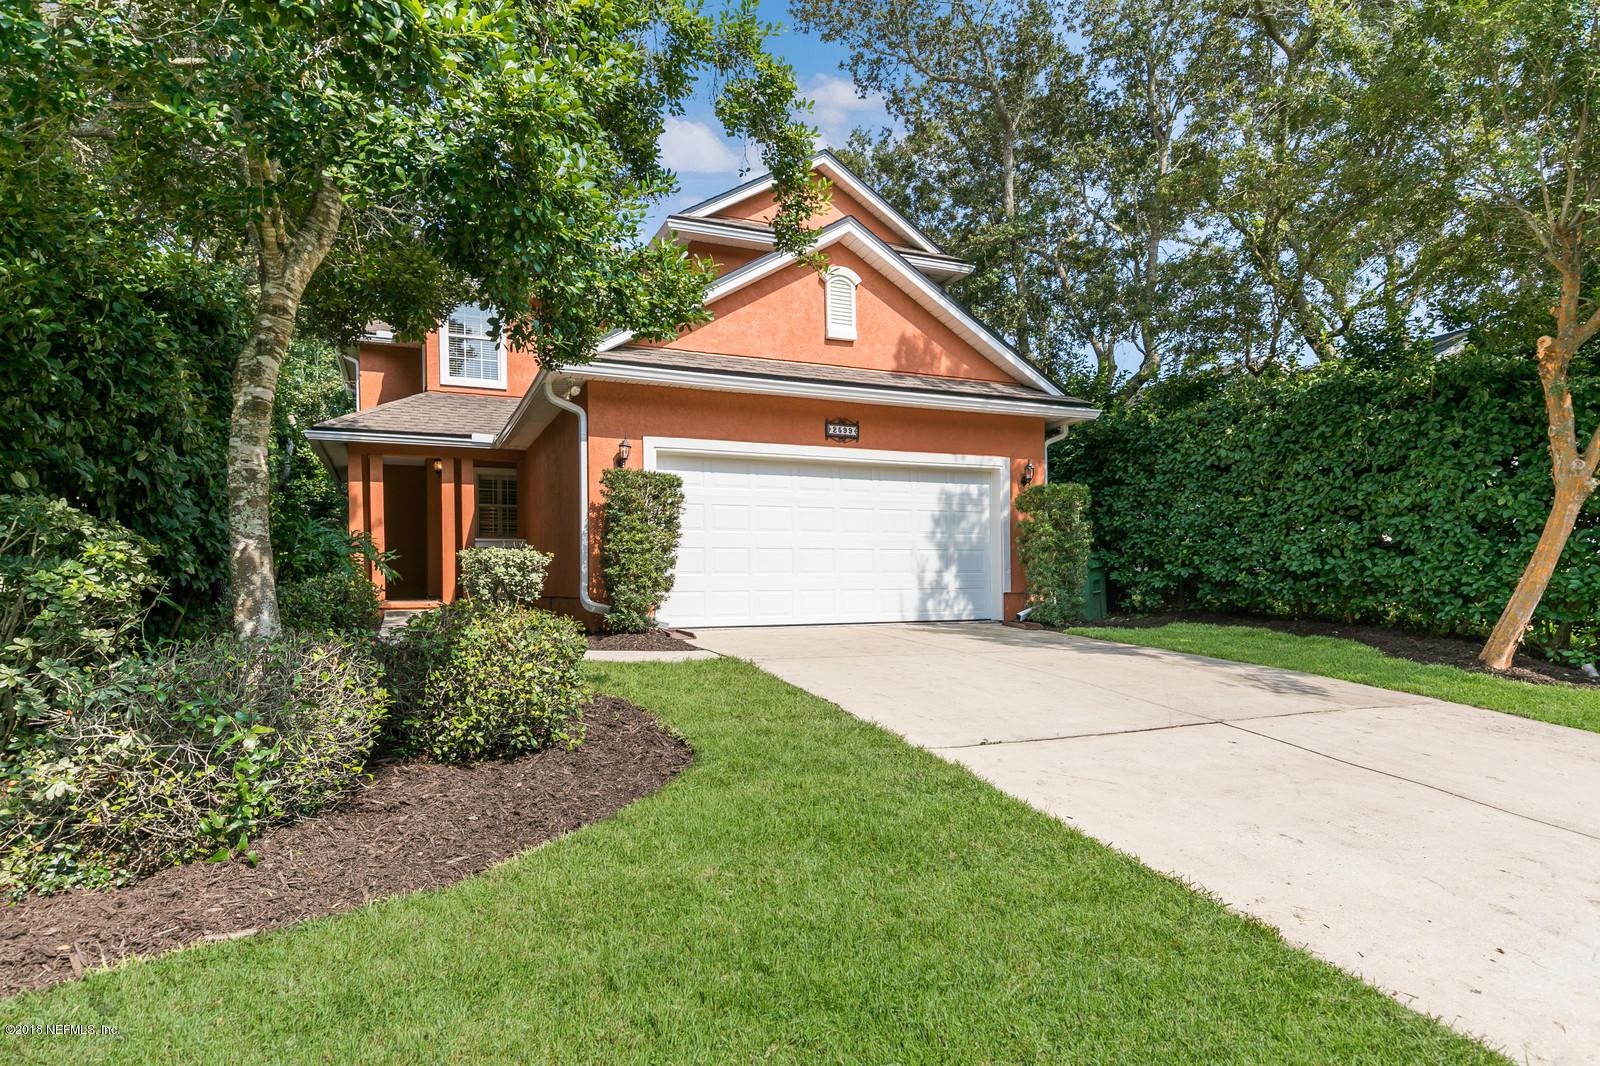 2599 MERRILL, JACKSONVILLE BEACH, FLORIDA 32250, 3 Bedrooms Bedrooms, ,2 BathroomsBathrooms,Residential - single family,For sale,MERRILL,954486